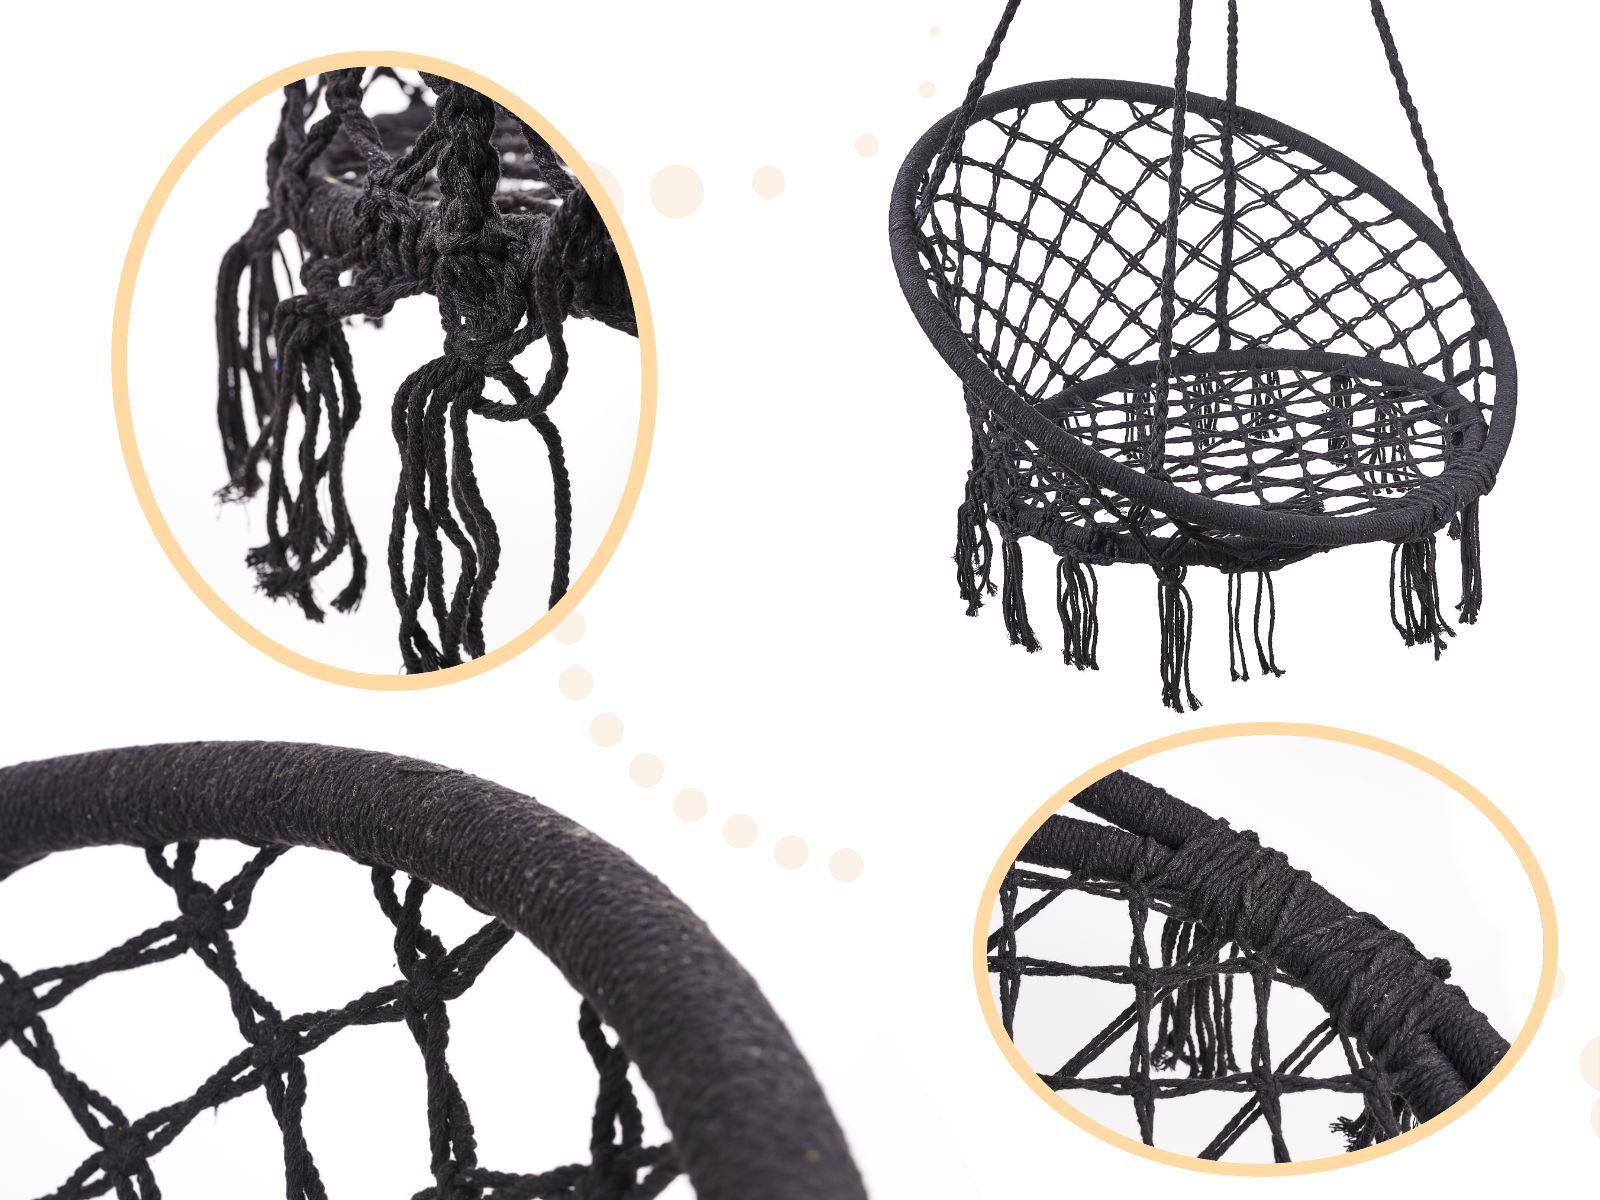 Houpací hnízdo GREY 80 cm se sedáky PATIO